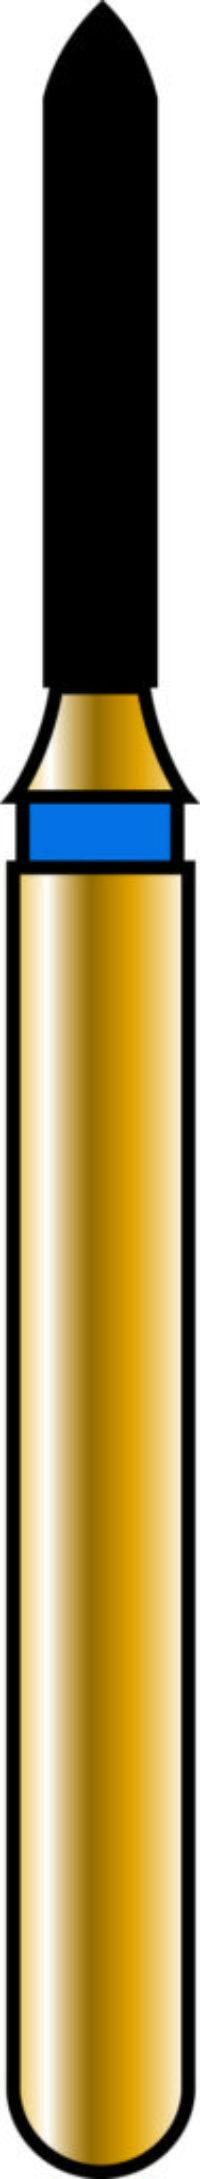 Pointed Taper 10-6mm Gold Diamond Bur